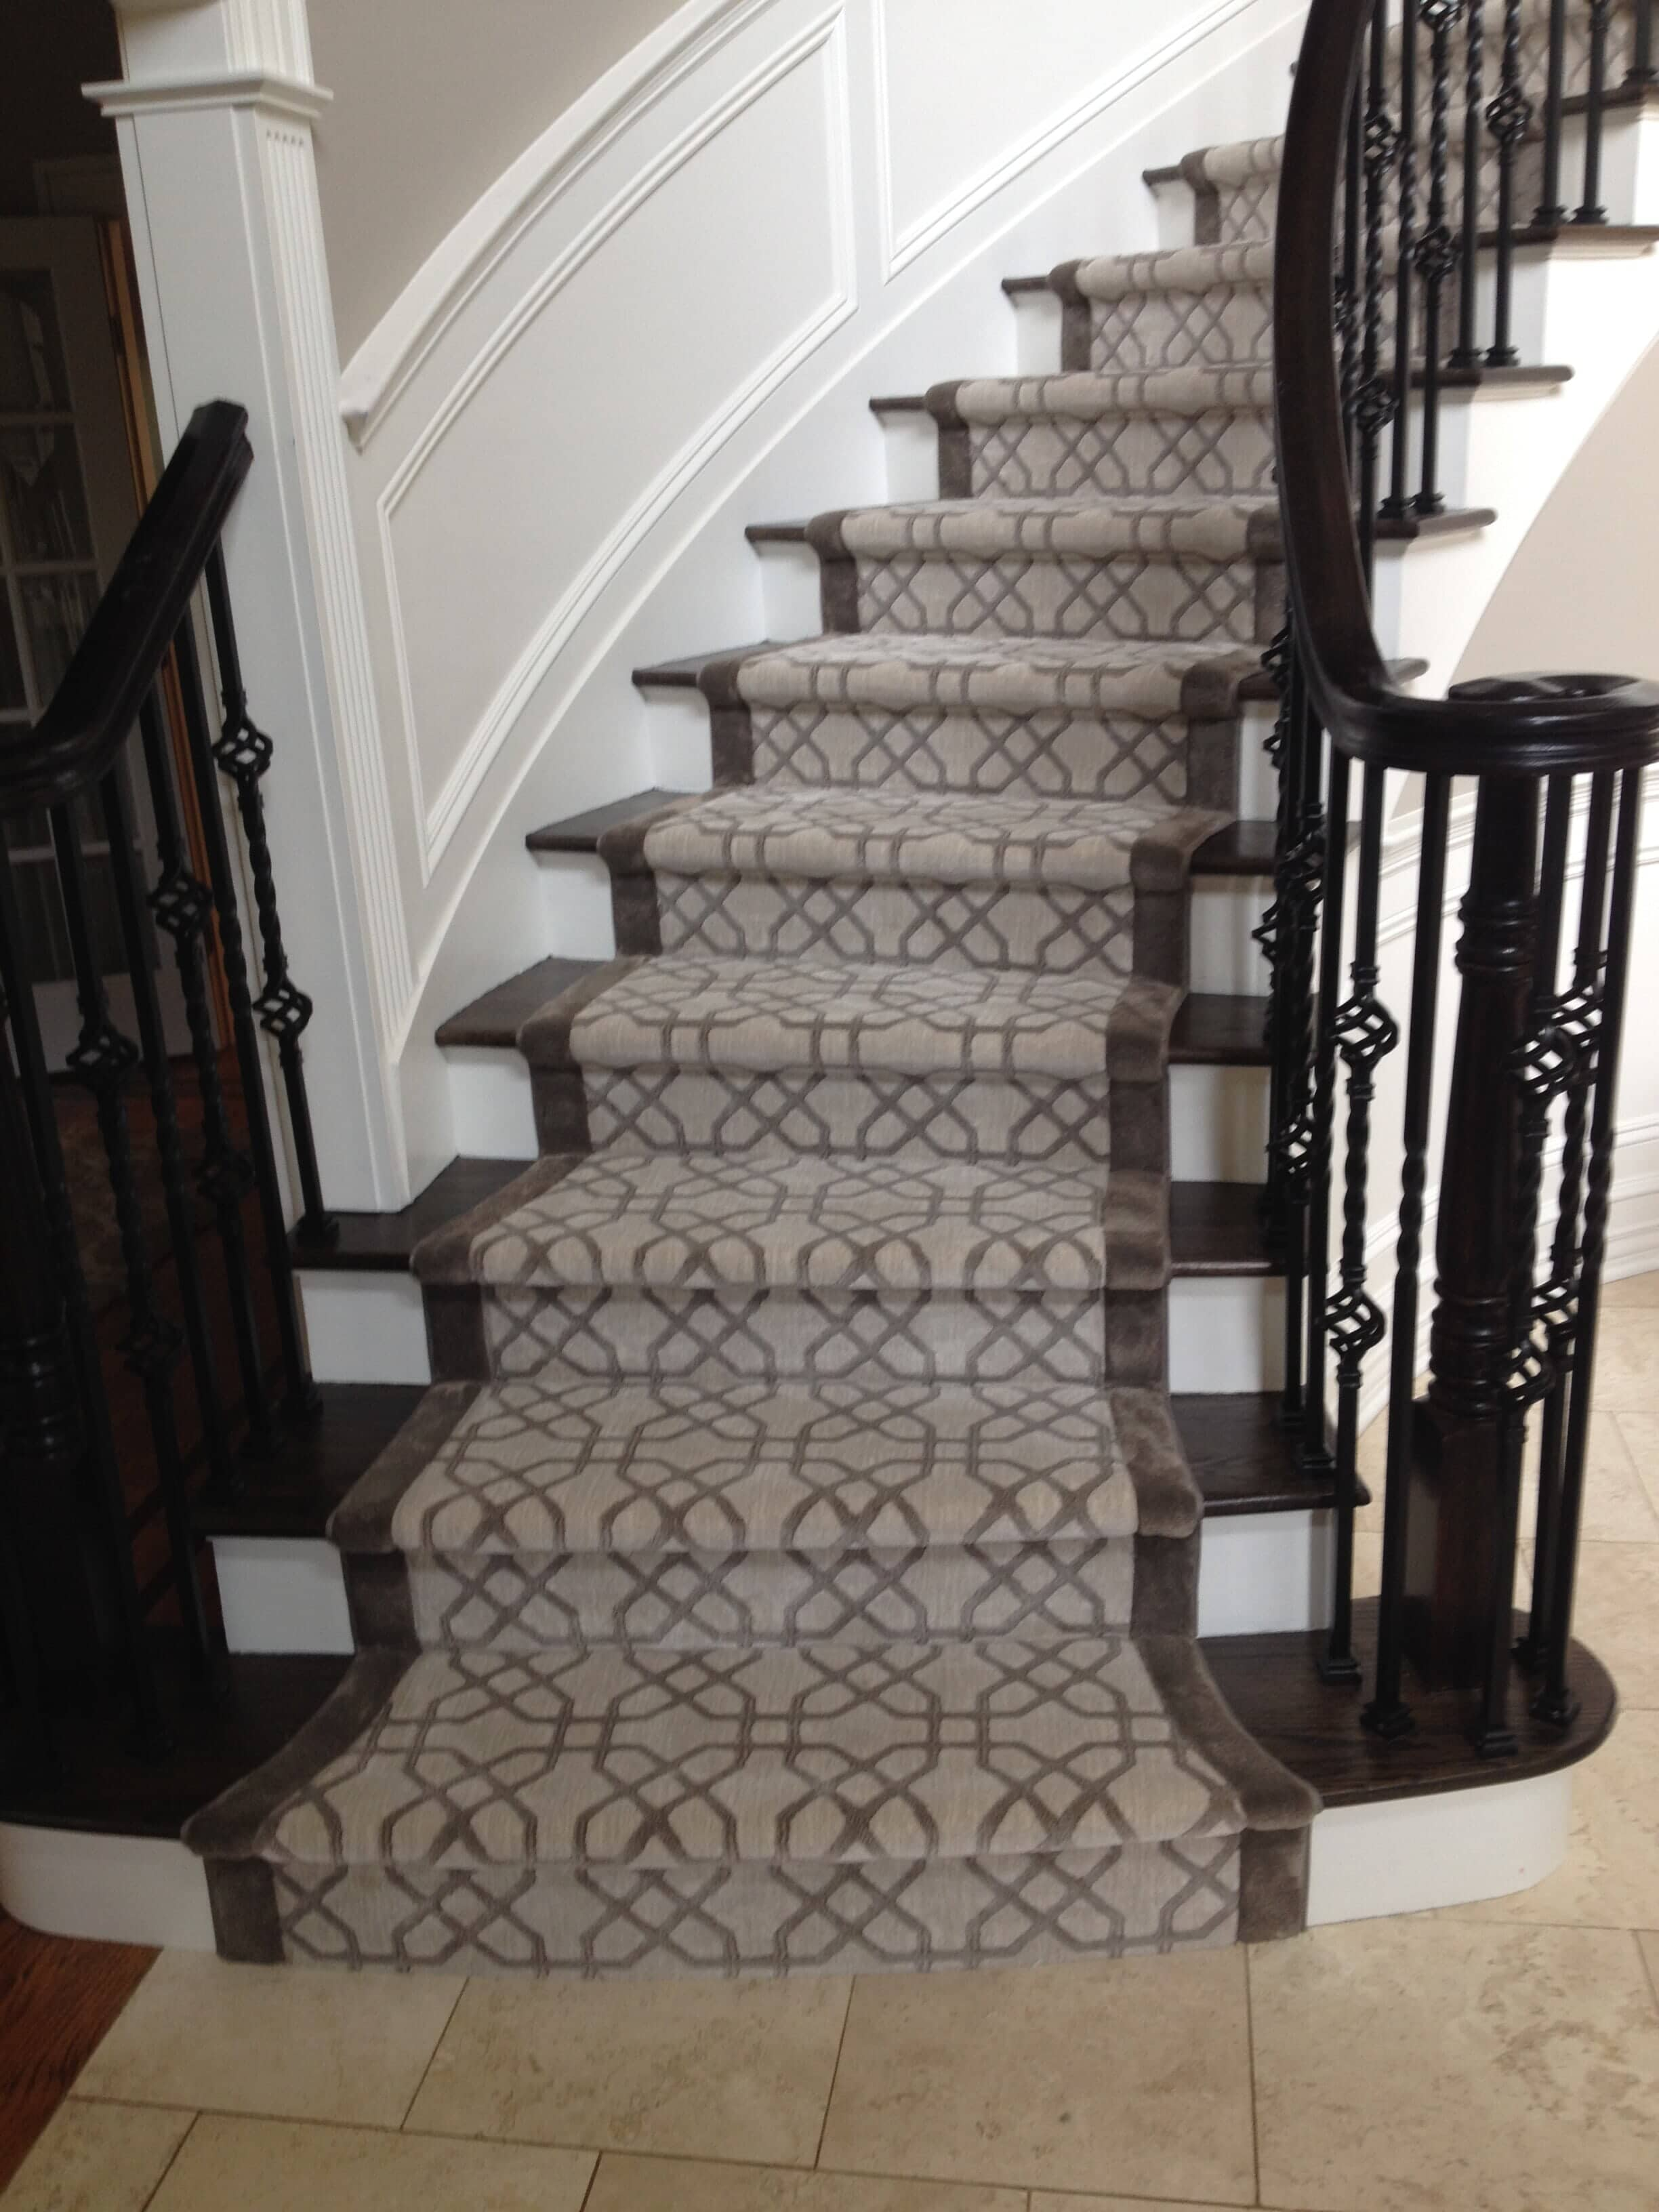 Custom Hallway & Stair Runners in Paramus, NJ from G. Fried Flooring & Design